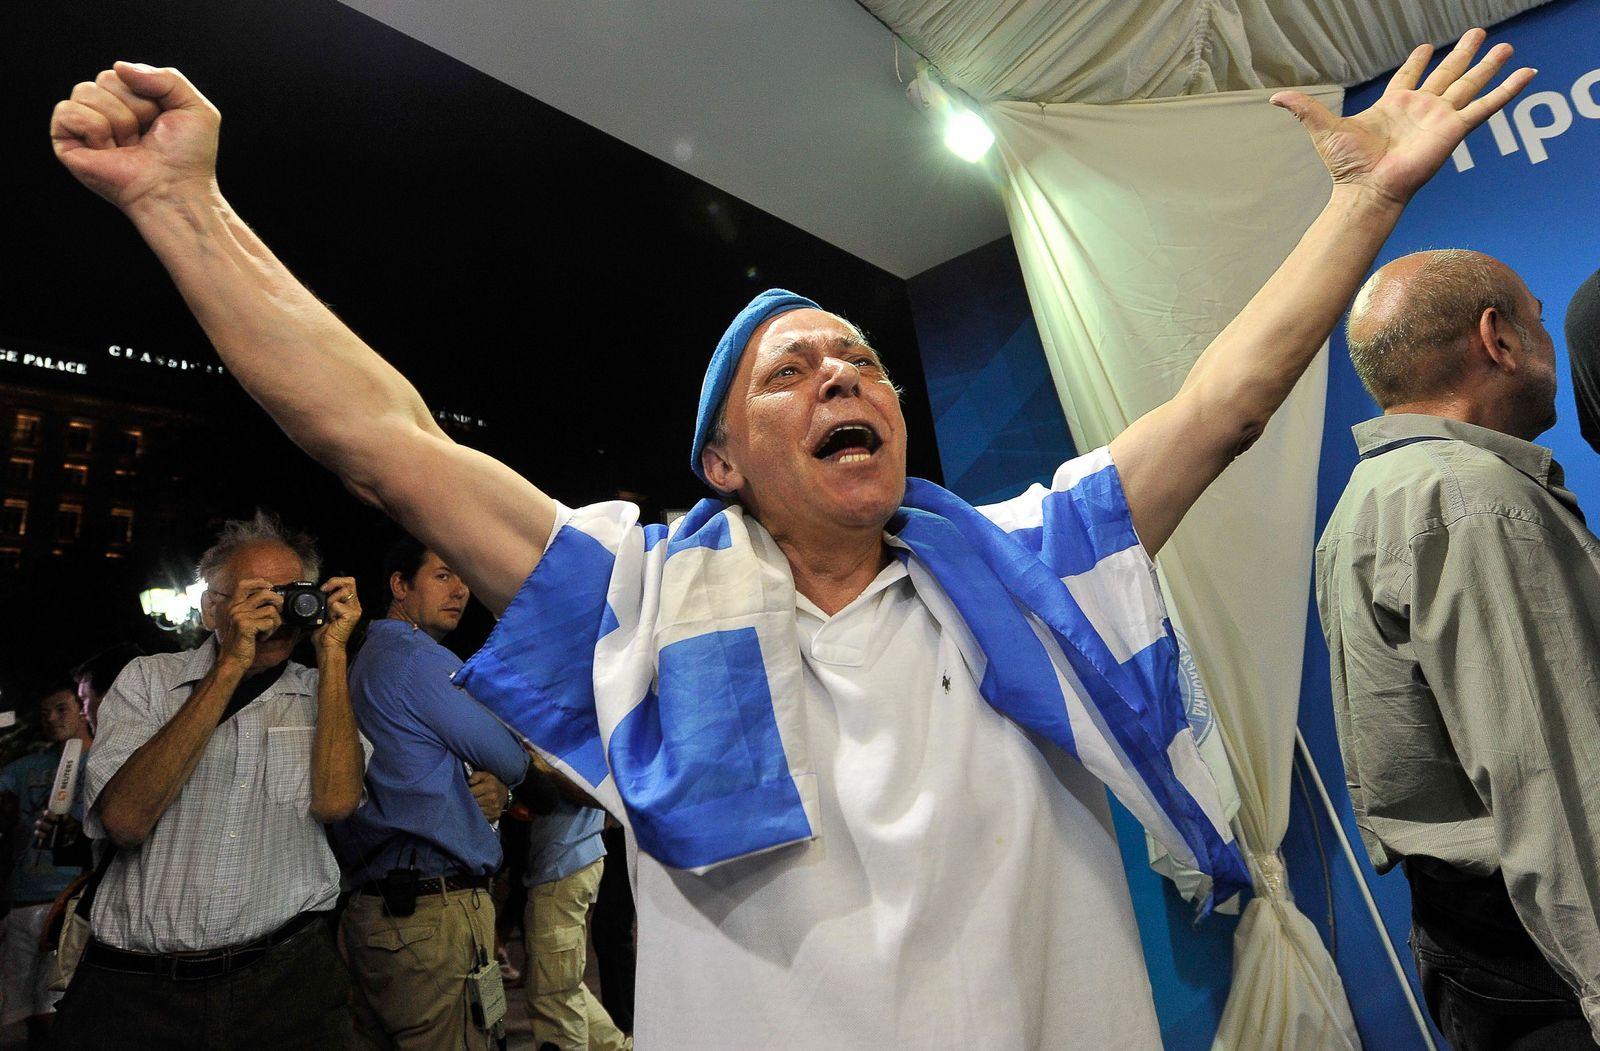 GREECE-VOTE-SAMARAS